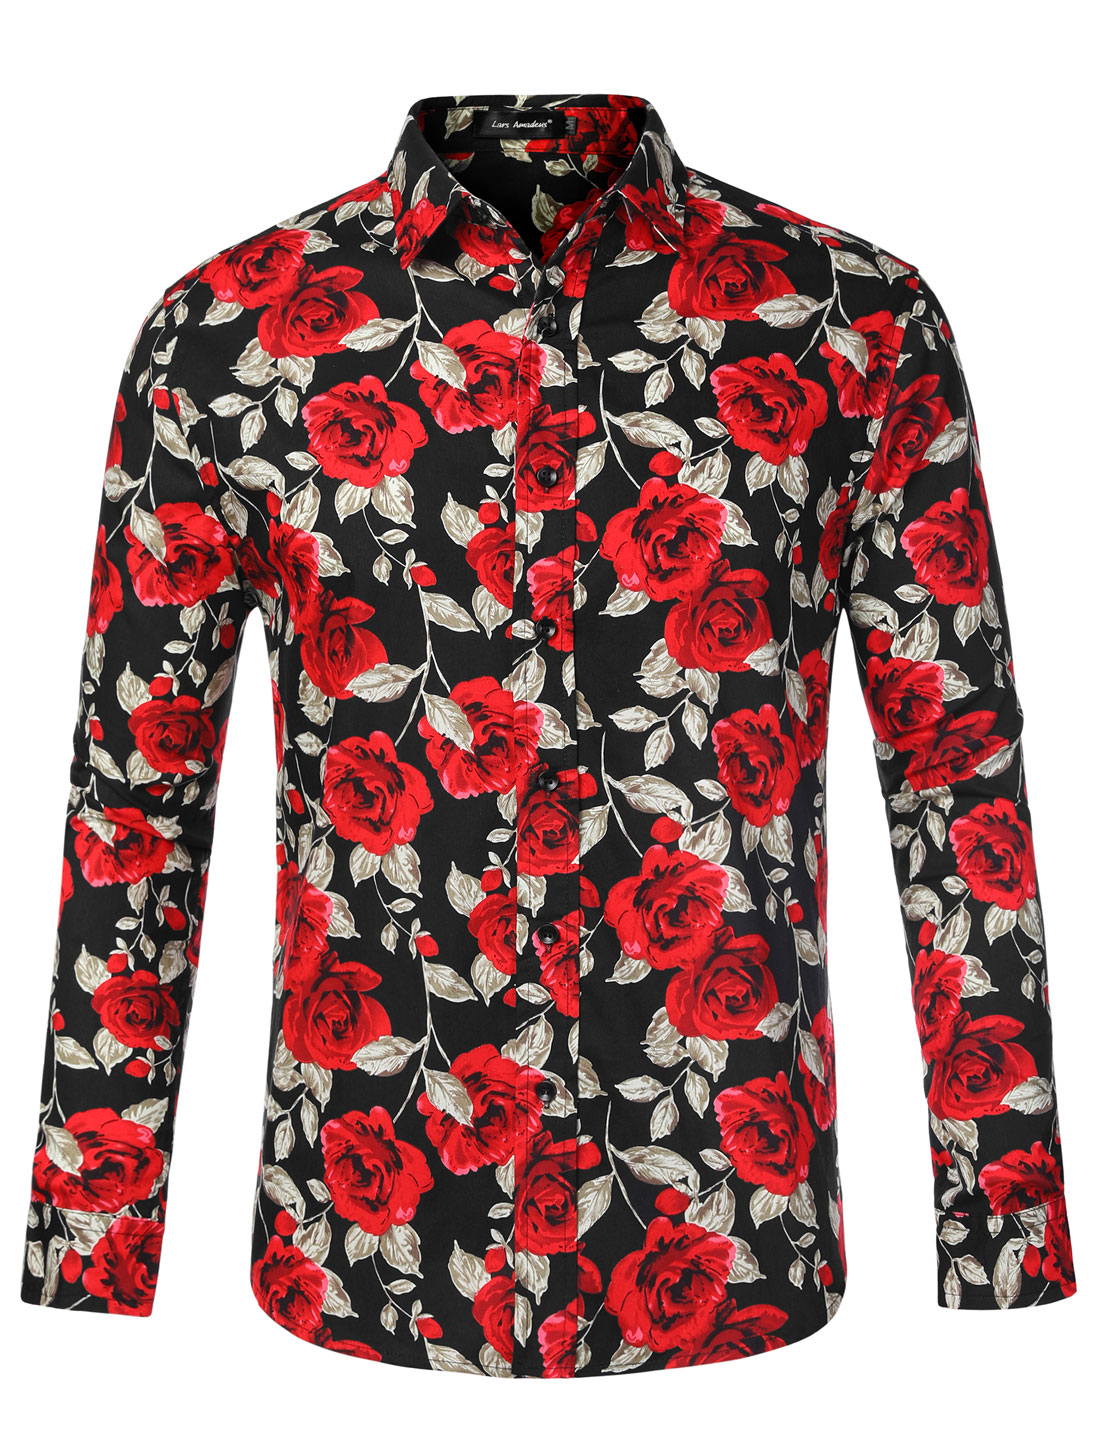 Men Floral Hawaiian Palm Flower Printed Shirt Black Rose S (US 34)